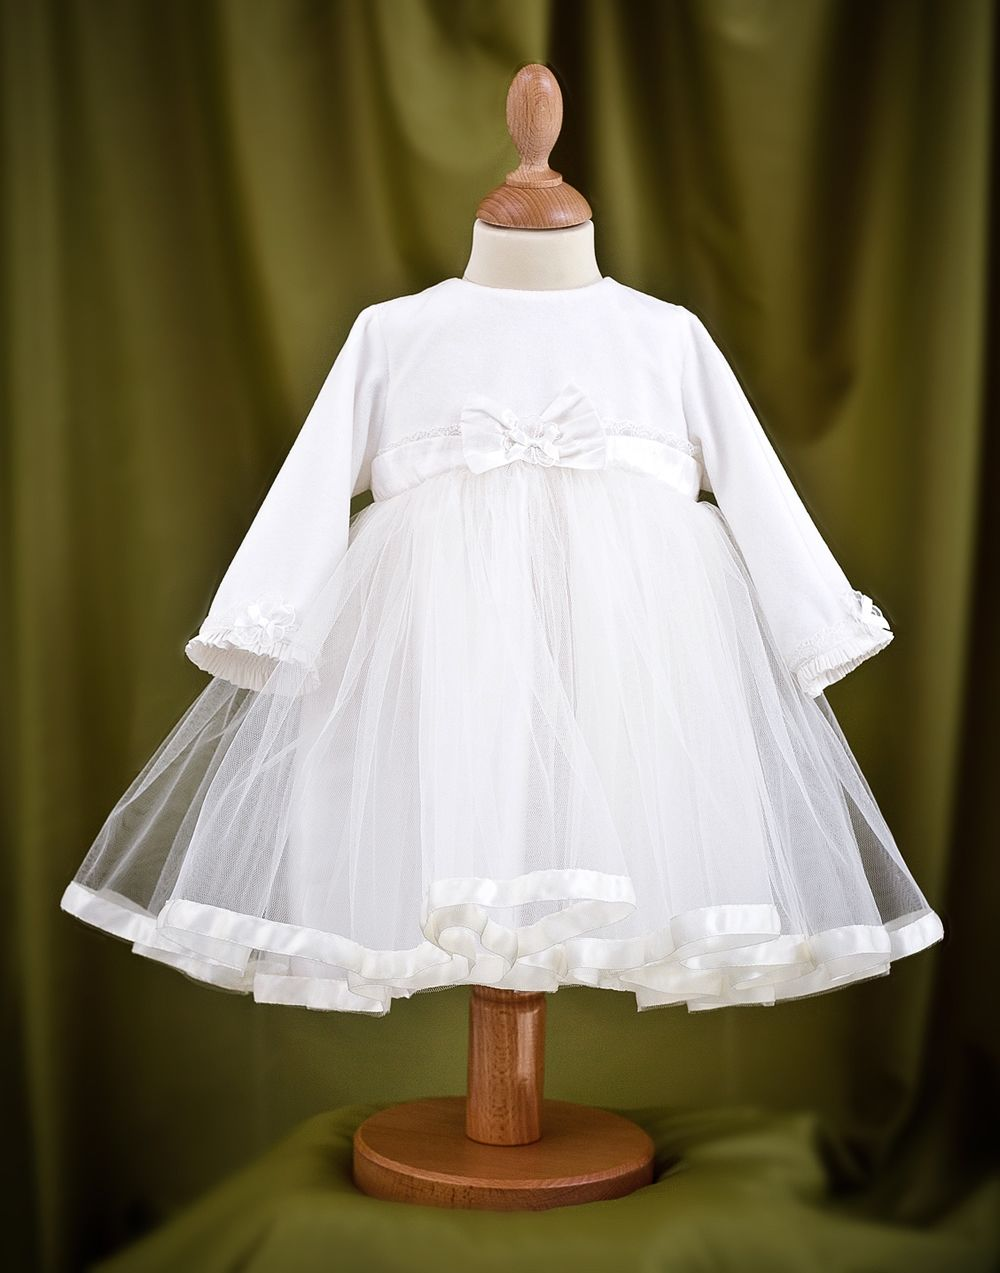 3b9f12aee winter christening dress - Google Search. winter christening dress - Google  Search Girls Occasion Dresses ...